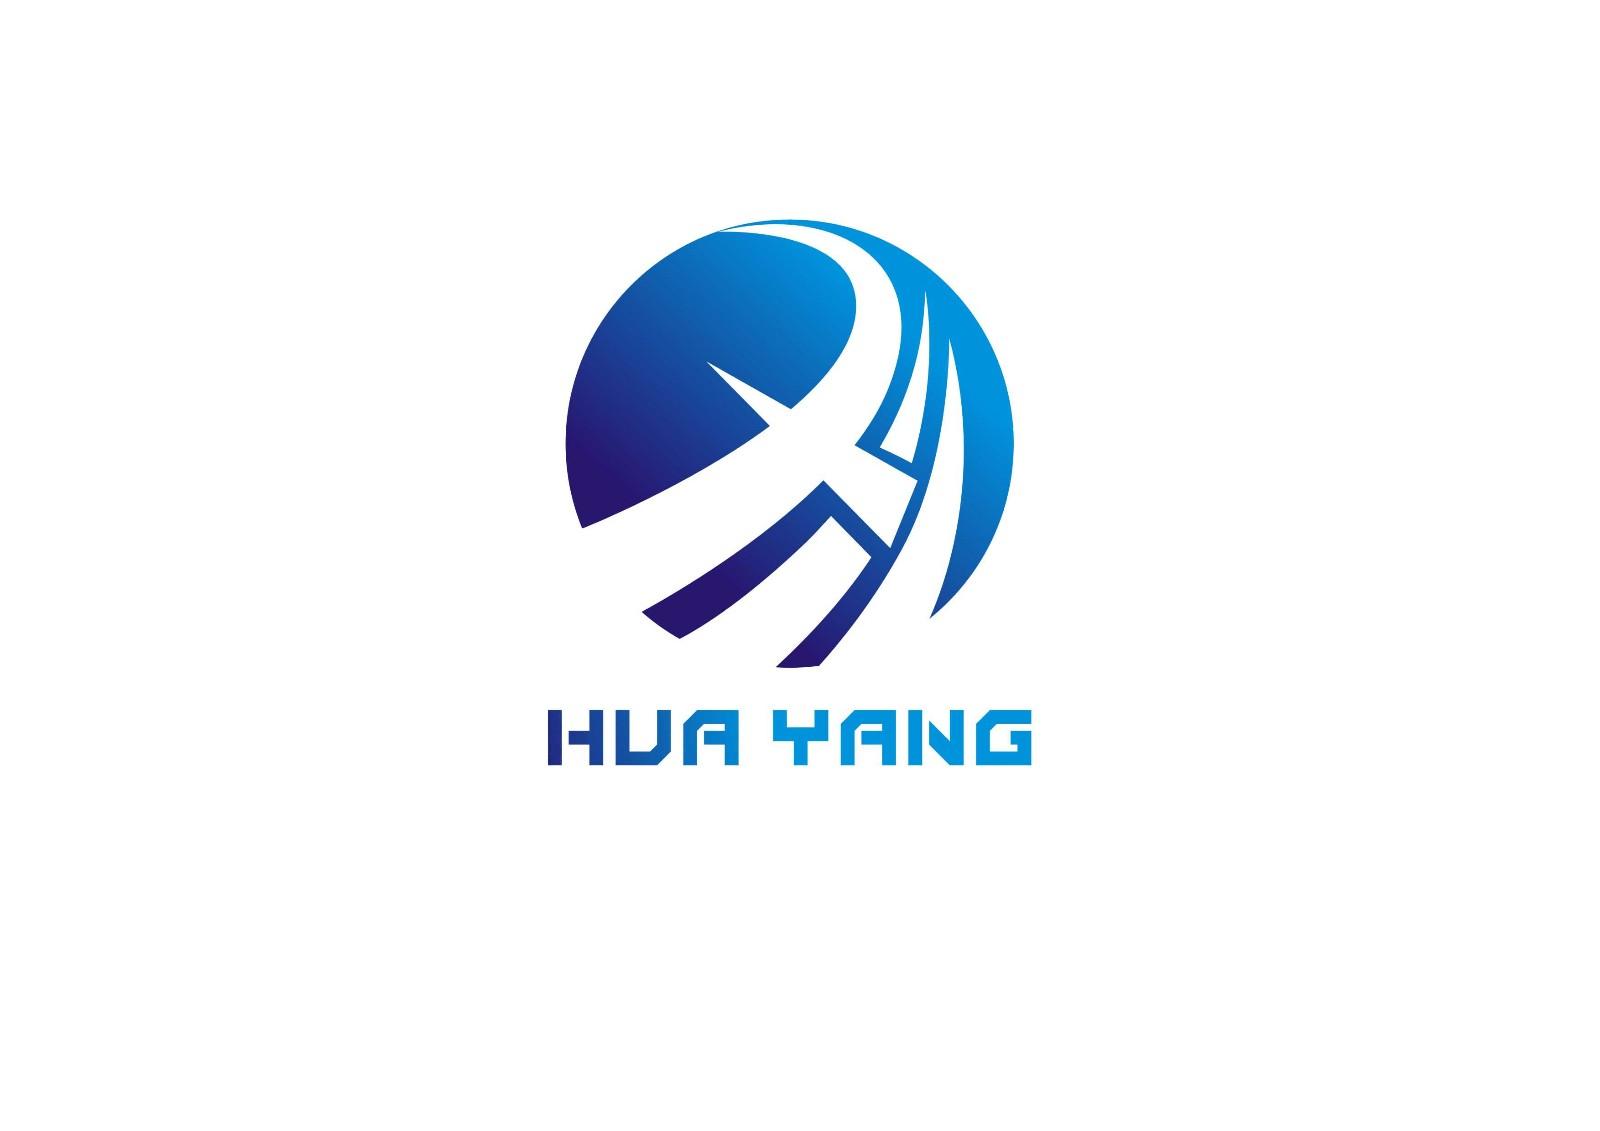 GUANGZHOU HUAYANG INTERNATIONAL LOGISTICS LTD